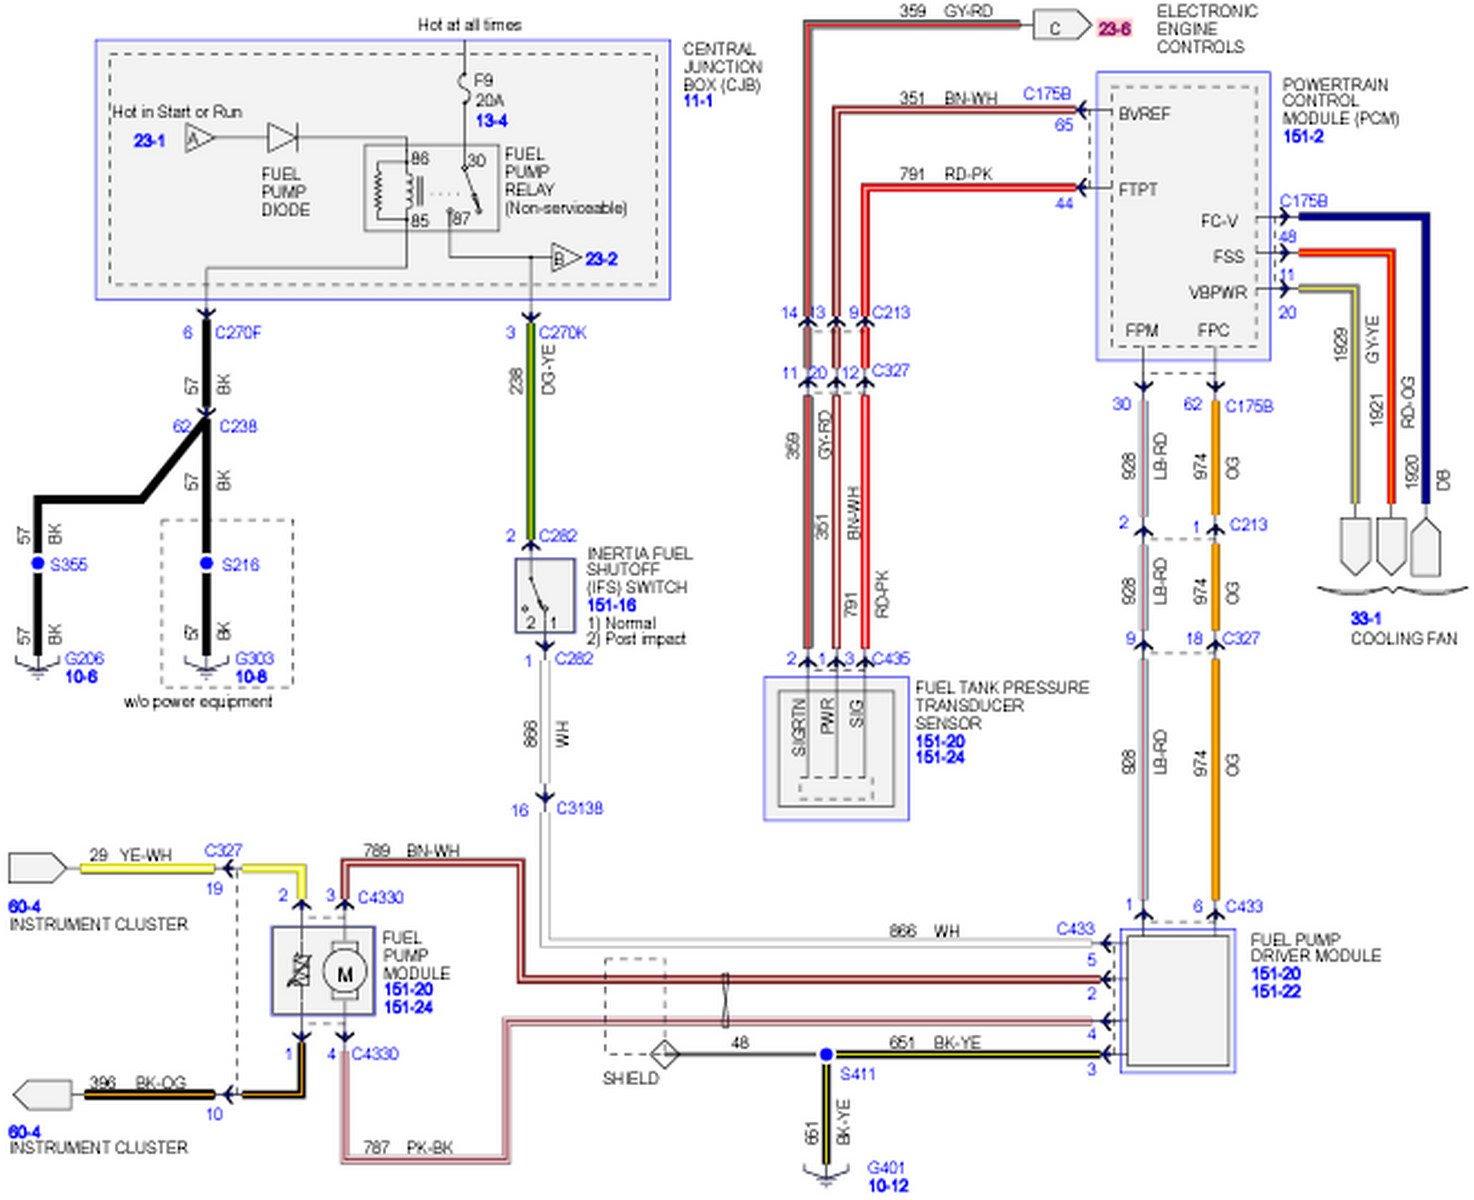 87 F150 Fuel Wiring Diagram Wiring Diagram Information Information Musikami It